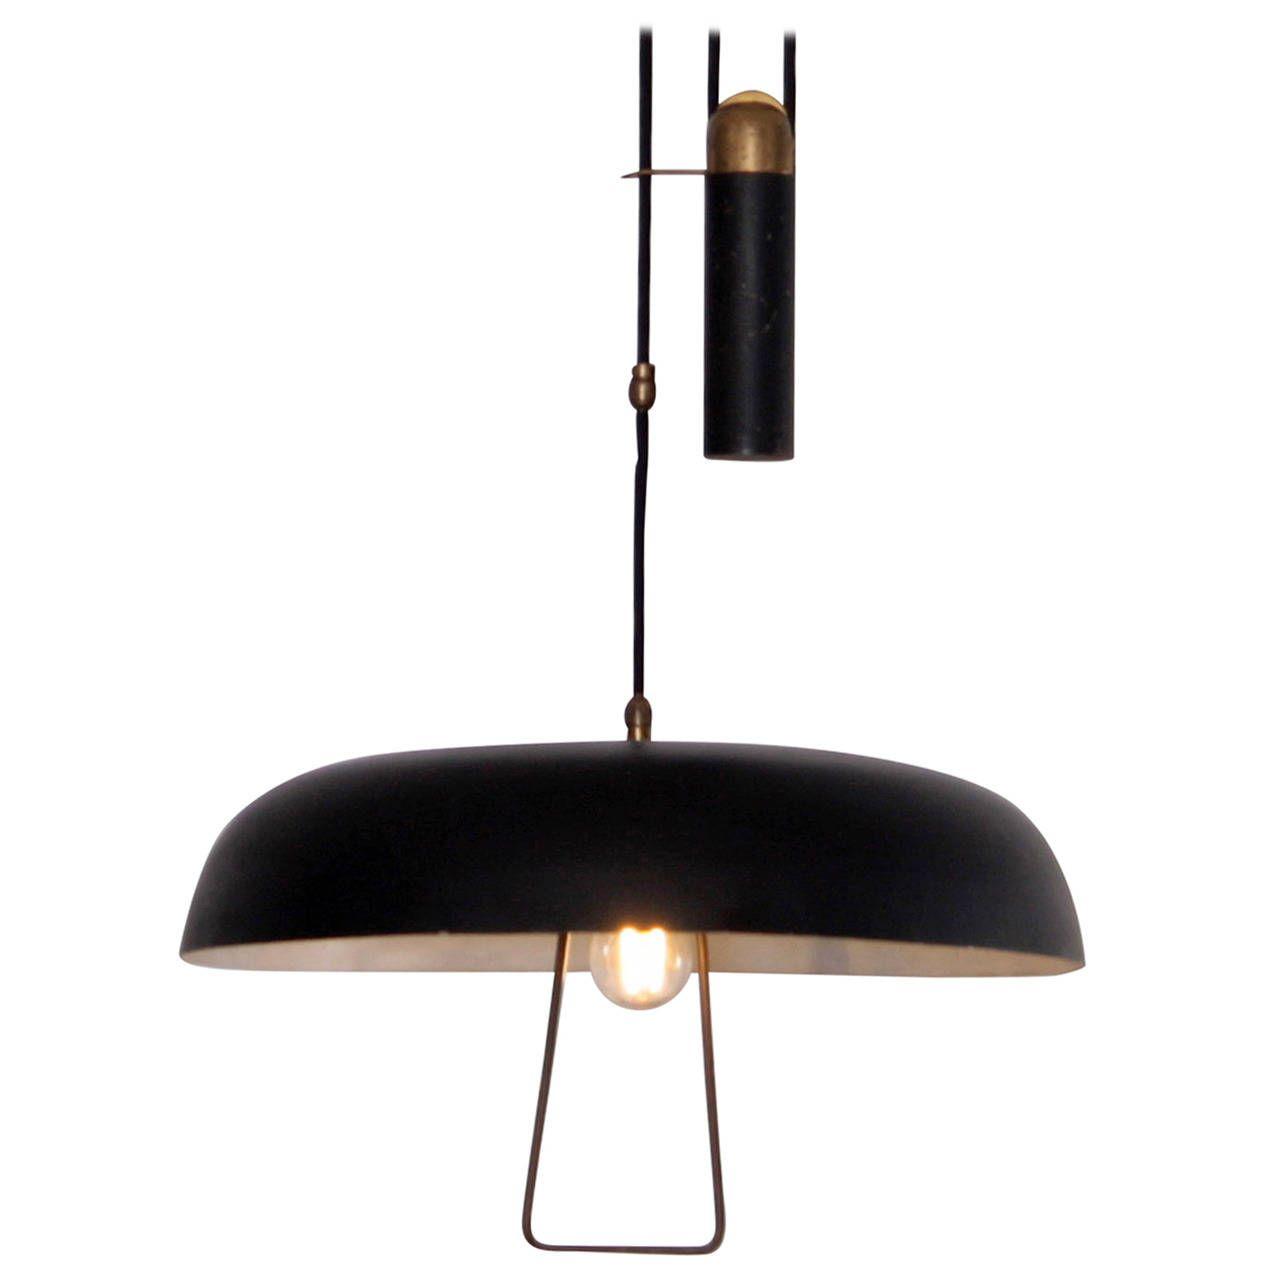 italian pendant lighting. Early 1950s Italian Counterweight Pendant Lamp Lighting N